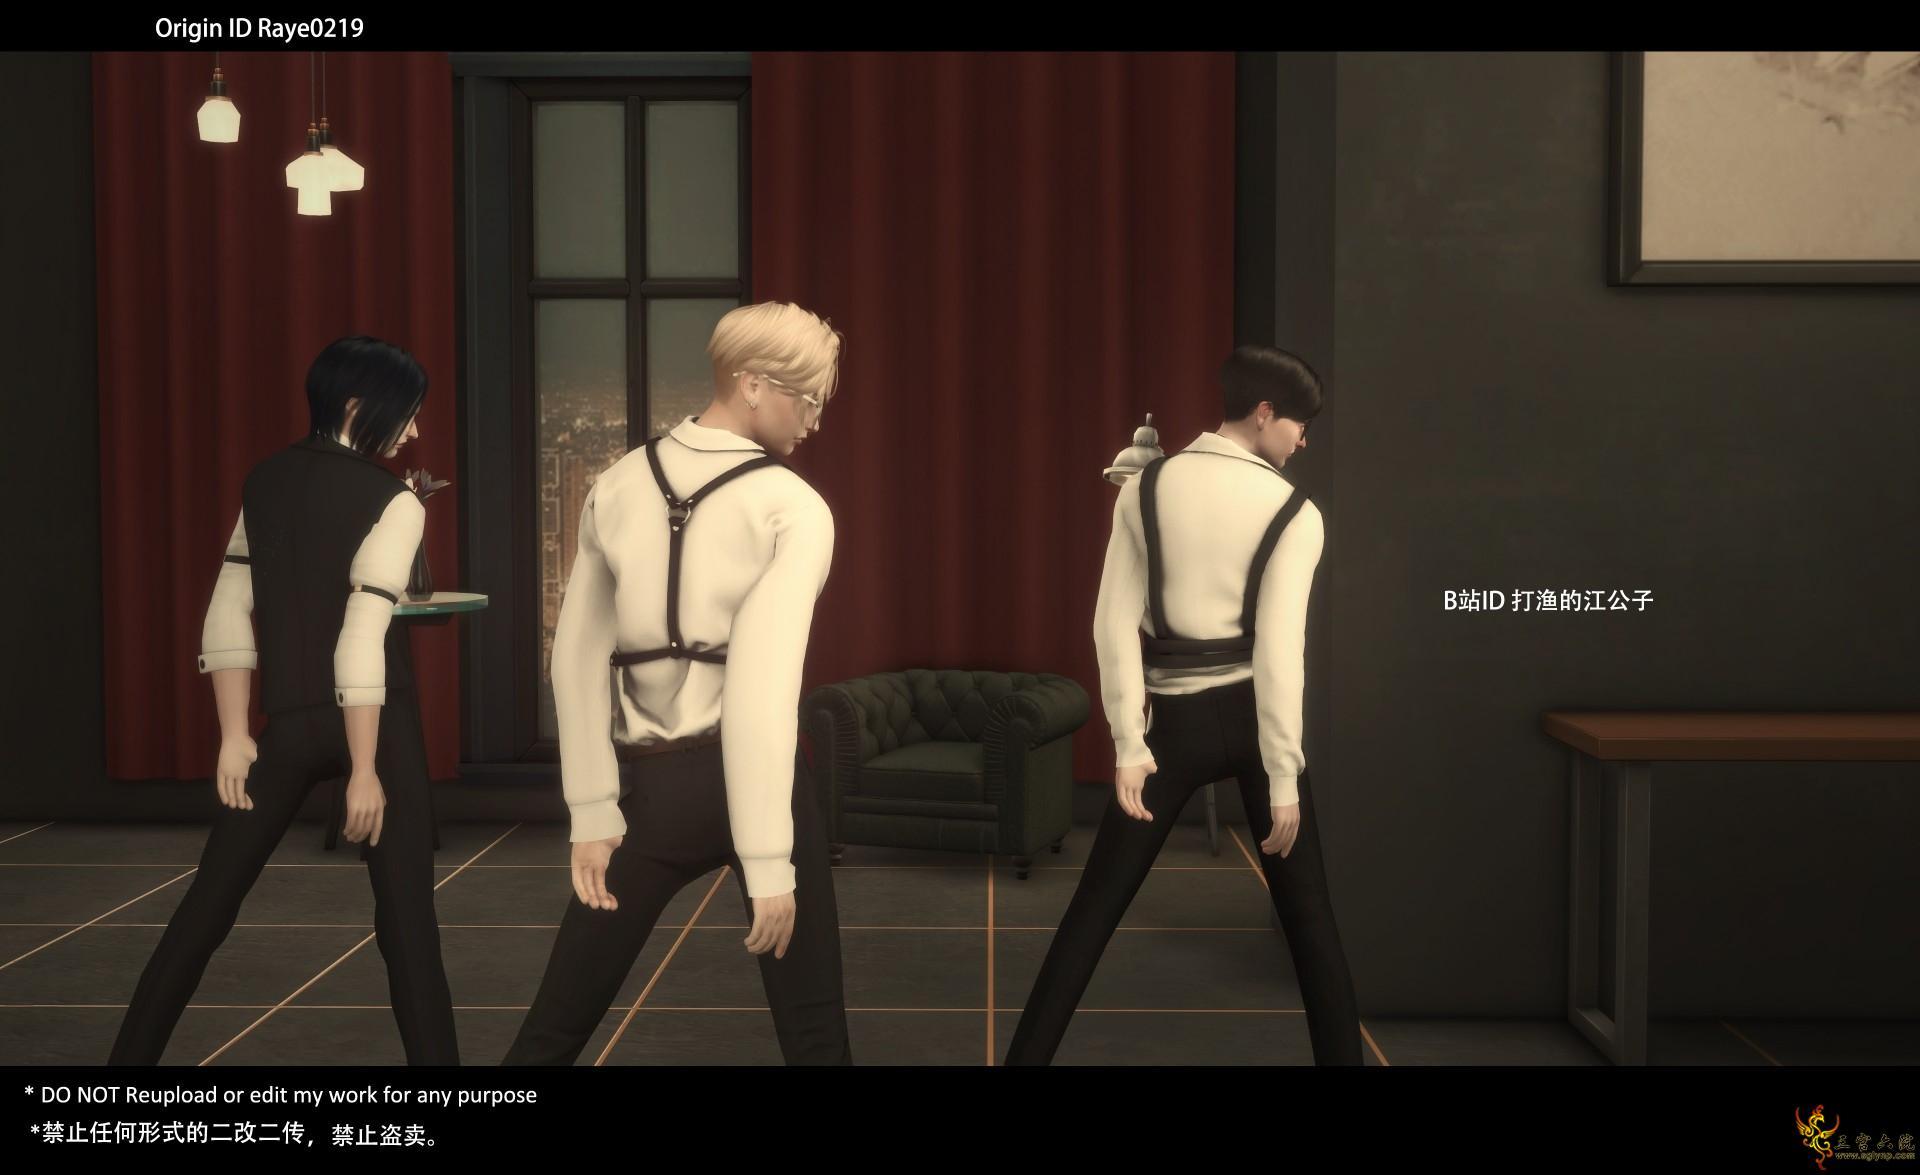 【R219】MMD Dance Pose Conqueror 04 .jpg